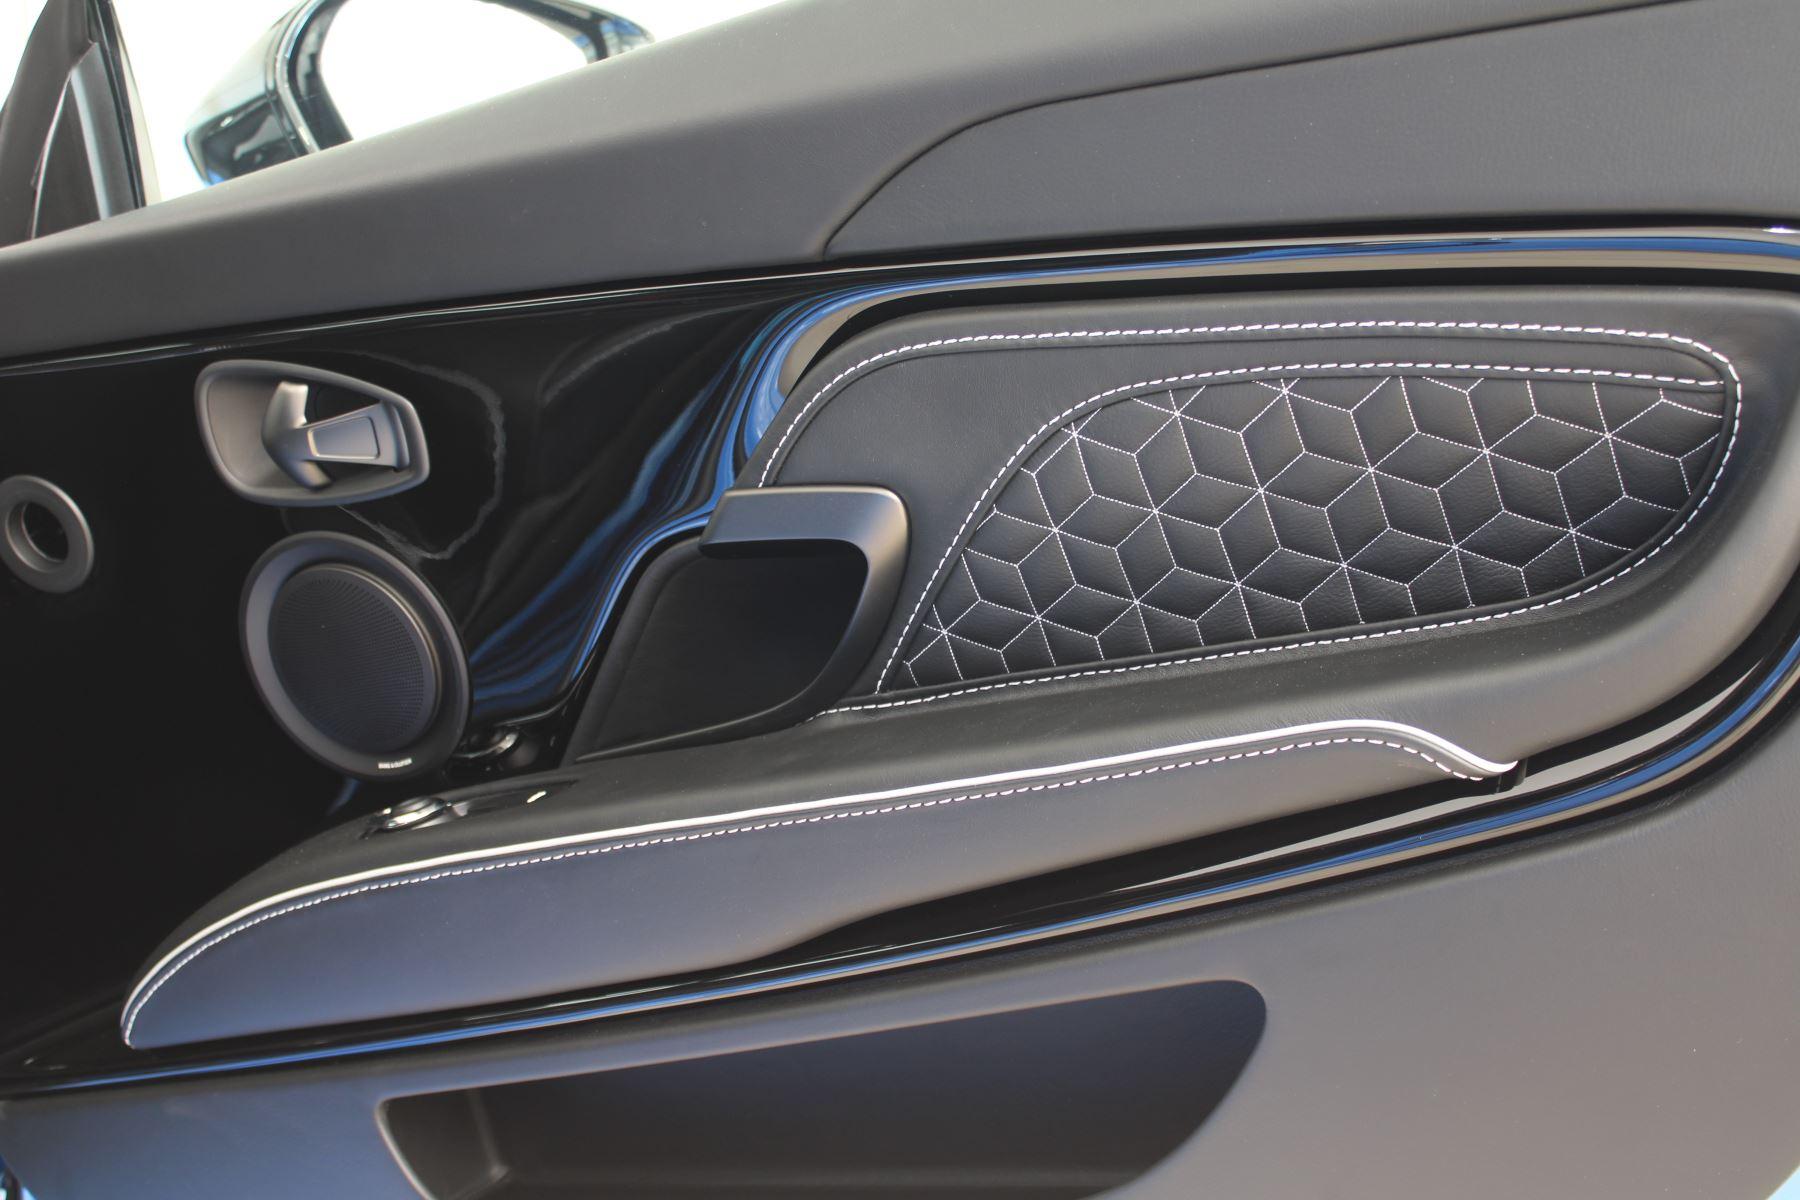 Aston Martin DBS V12 Superleggera Touchtronic Special Ceramic Blue - B&O image 24